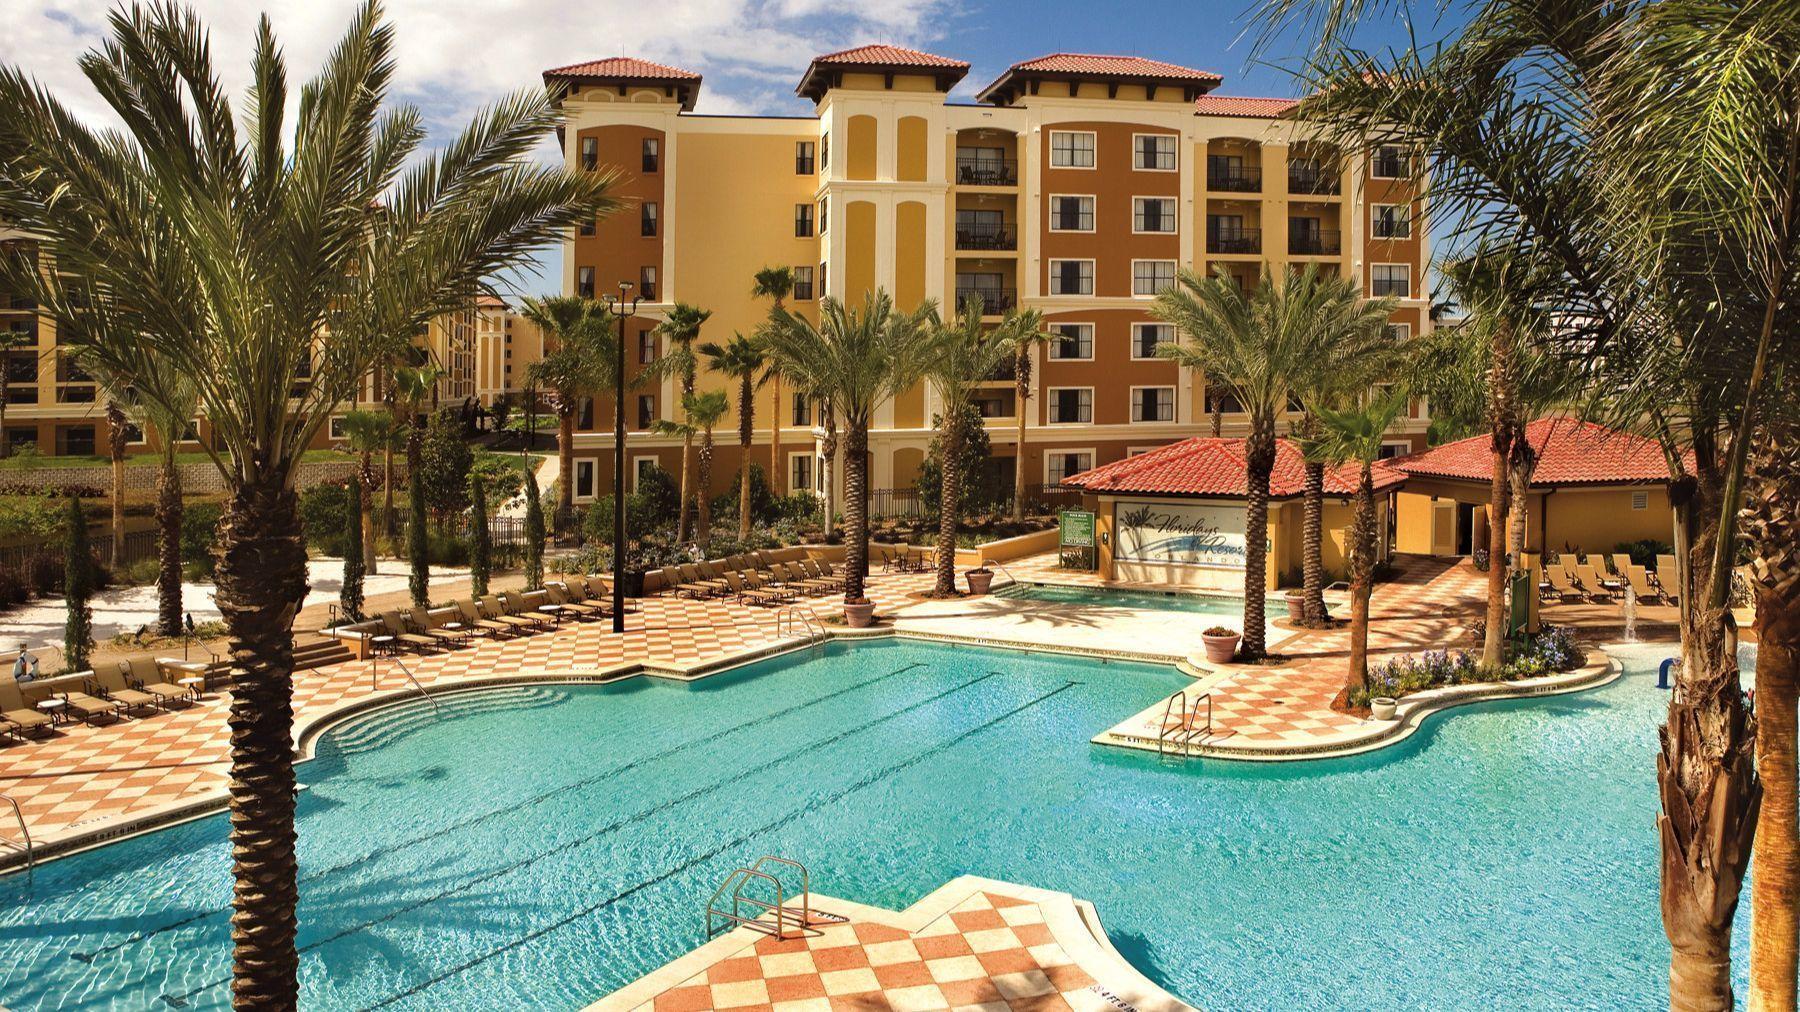 Best Kitchen Gallery: Florida Hotels Fare Well In Annual Best Hotels Ranking Orlando of Orlando Hotels Resorts  on rachelxblog.com